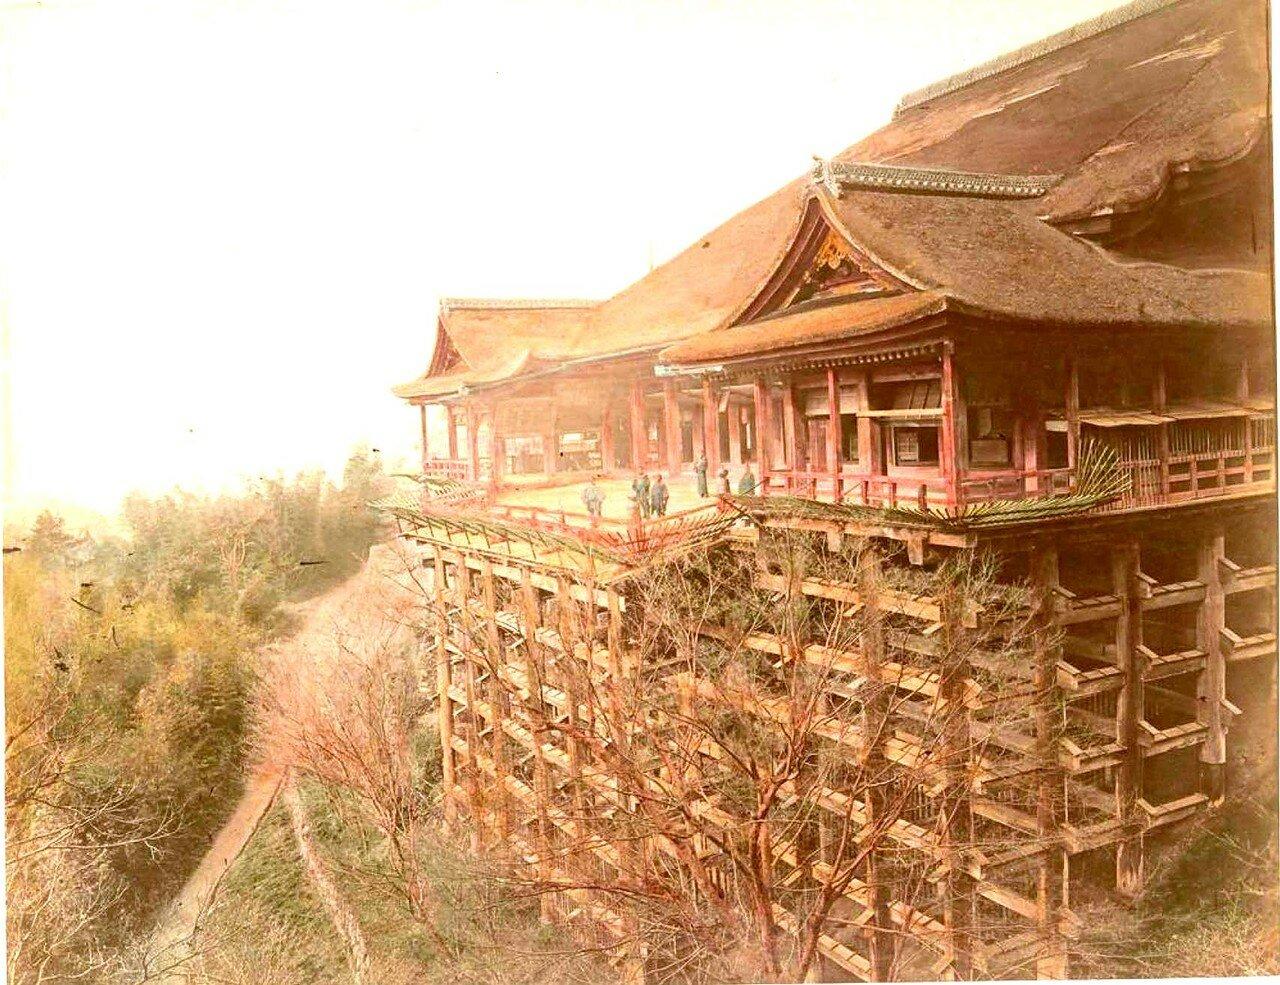 Киото. Храм Киёмидзудэра (Храм Чистой воды)